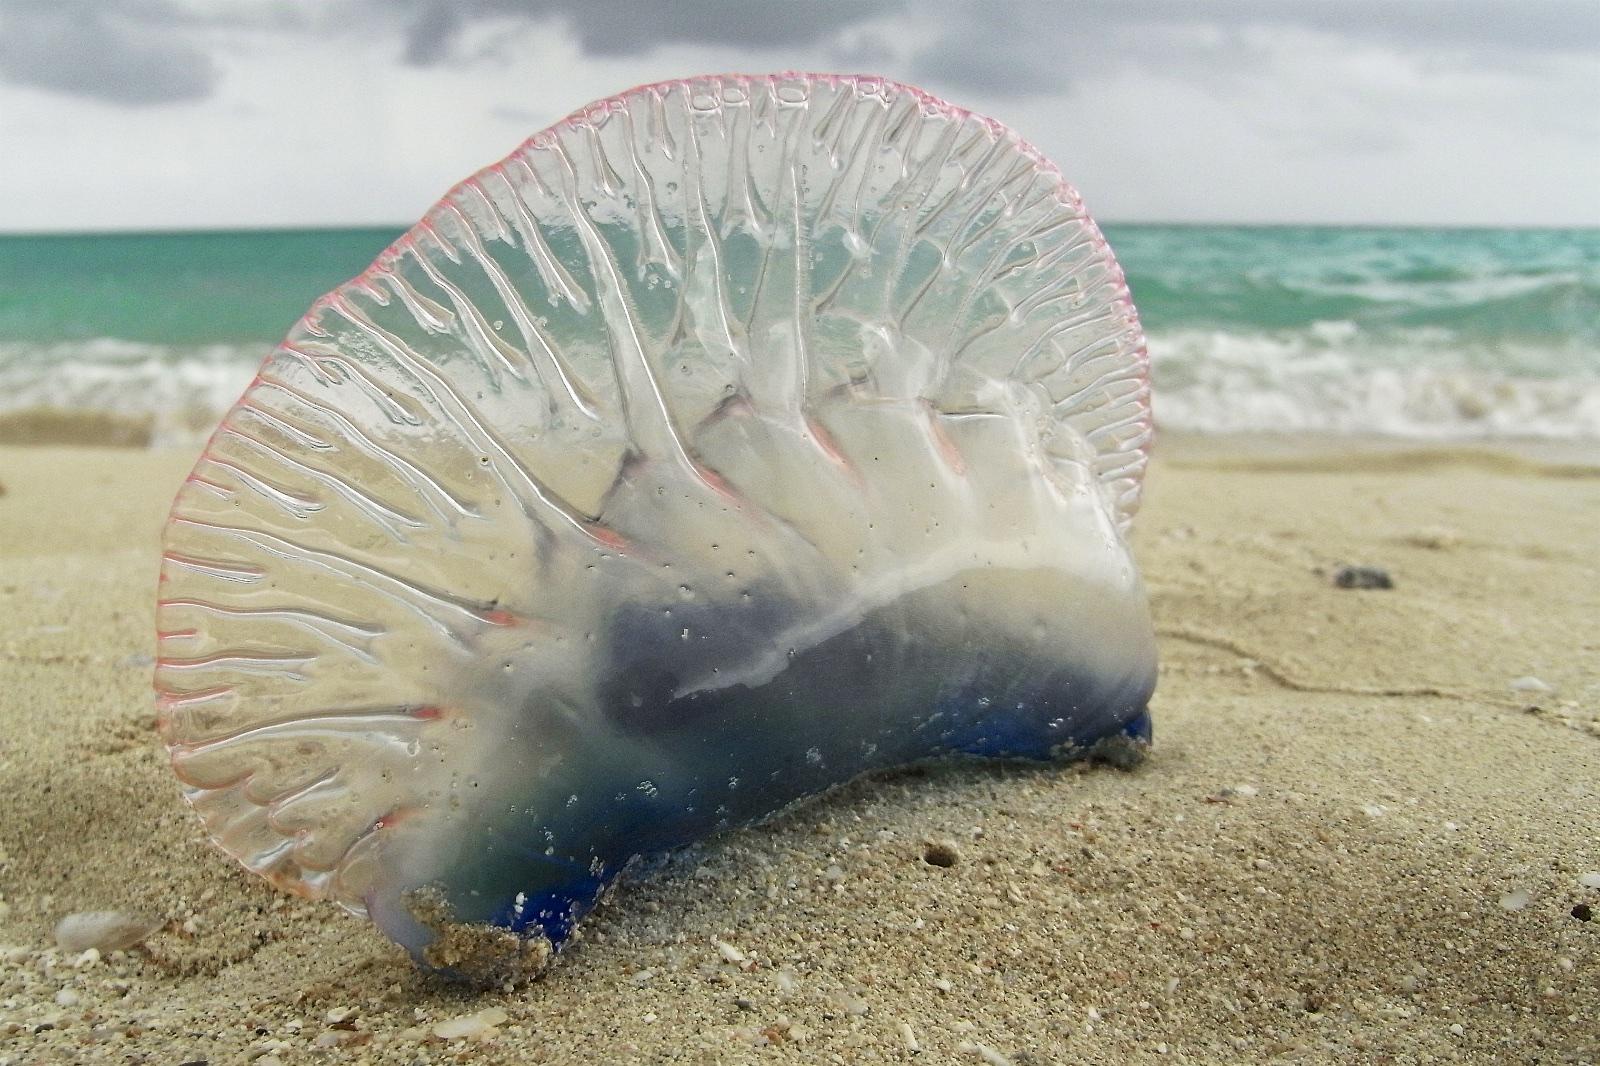 Portuguese man-o-war sightings fascinate beachgoers